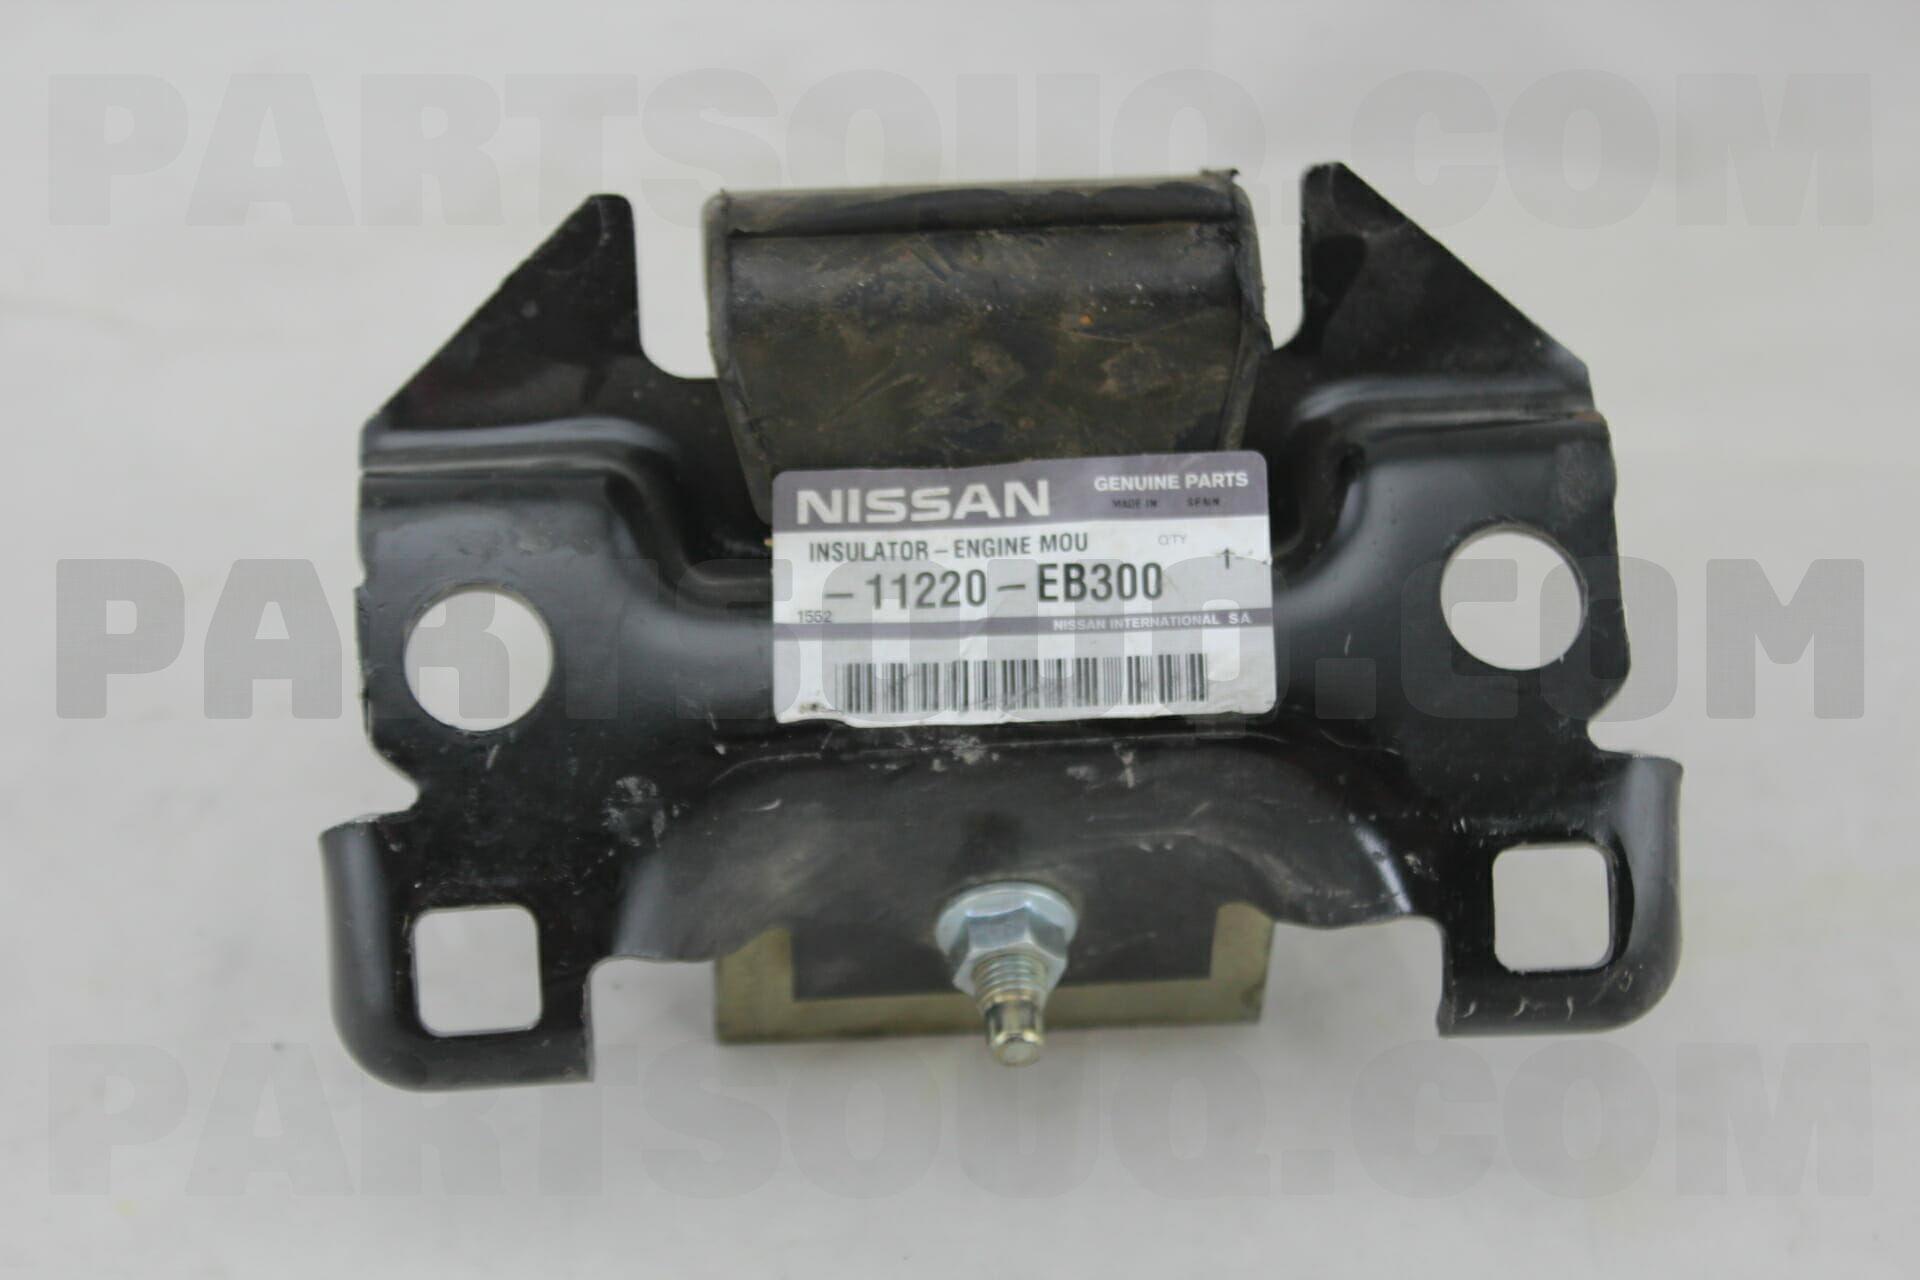 Ram 1500 Thermostat Location Moreover 3 3 Liter Dodge Engine Diagram